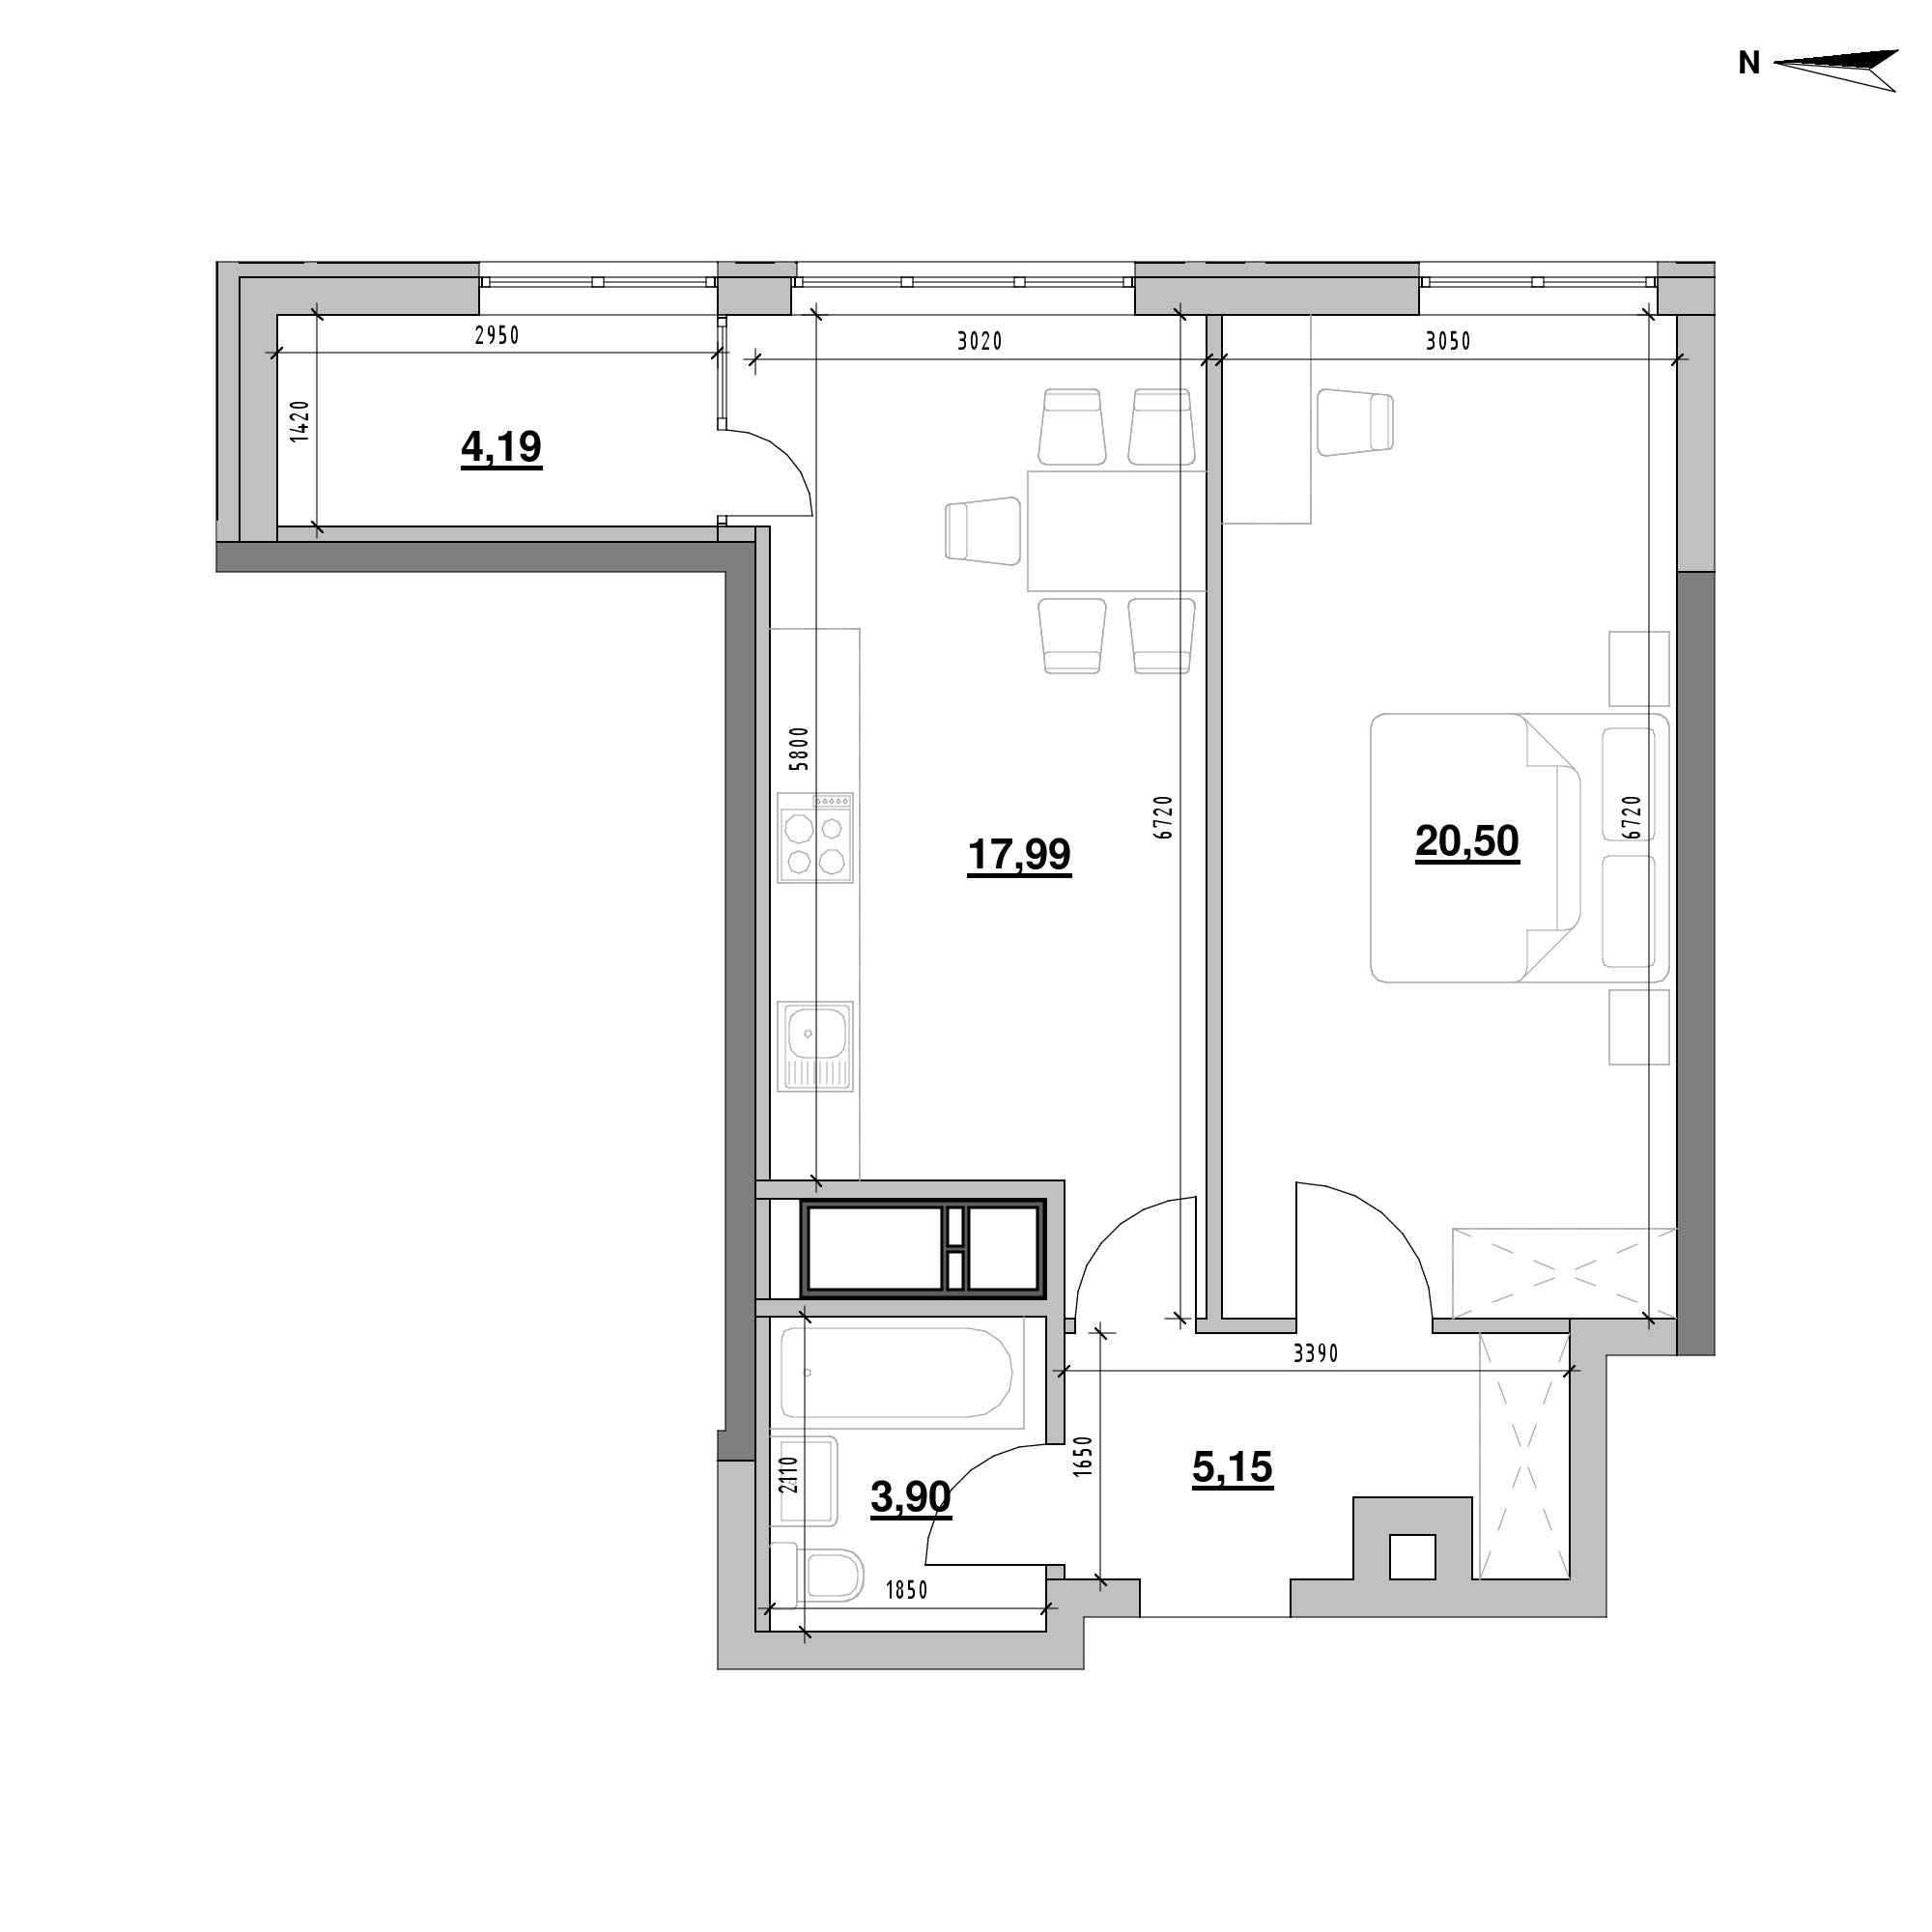 ЖК Nordica Residence: планування 1-кімнатної квартири, №199, 51.73 м<sup>2</sup>